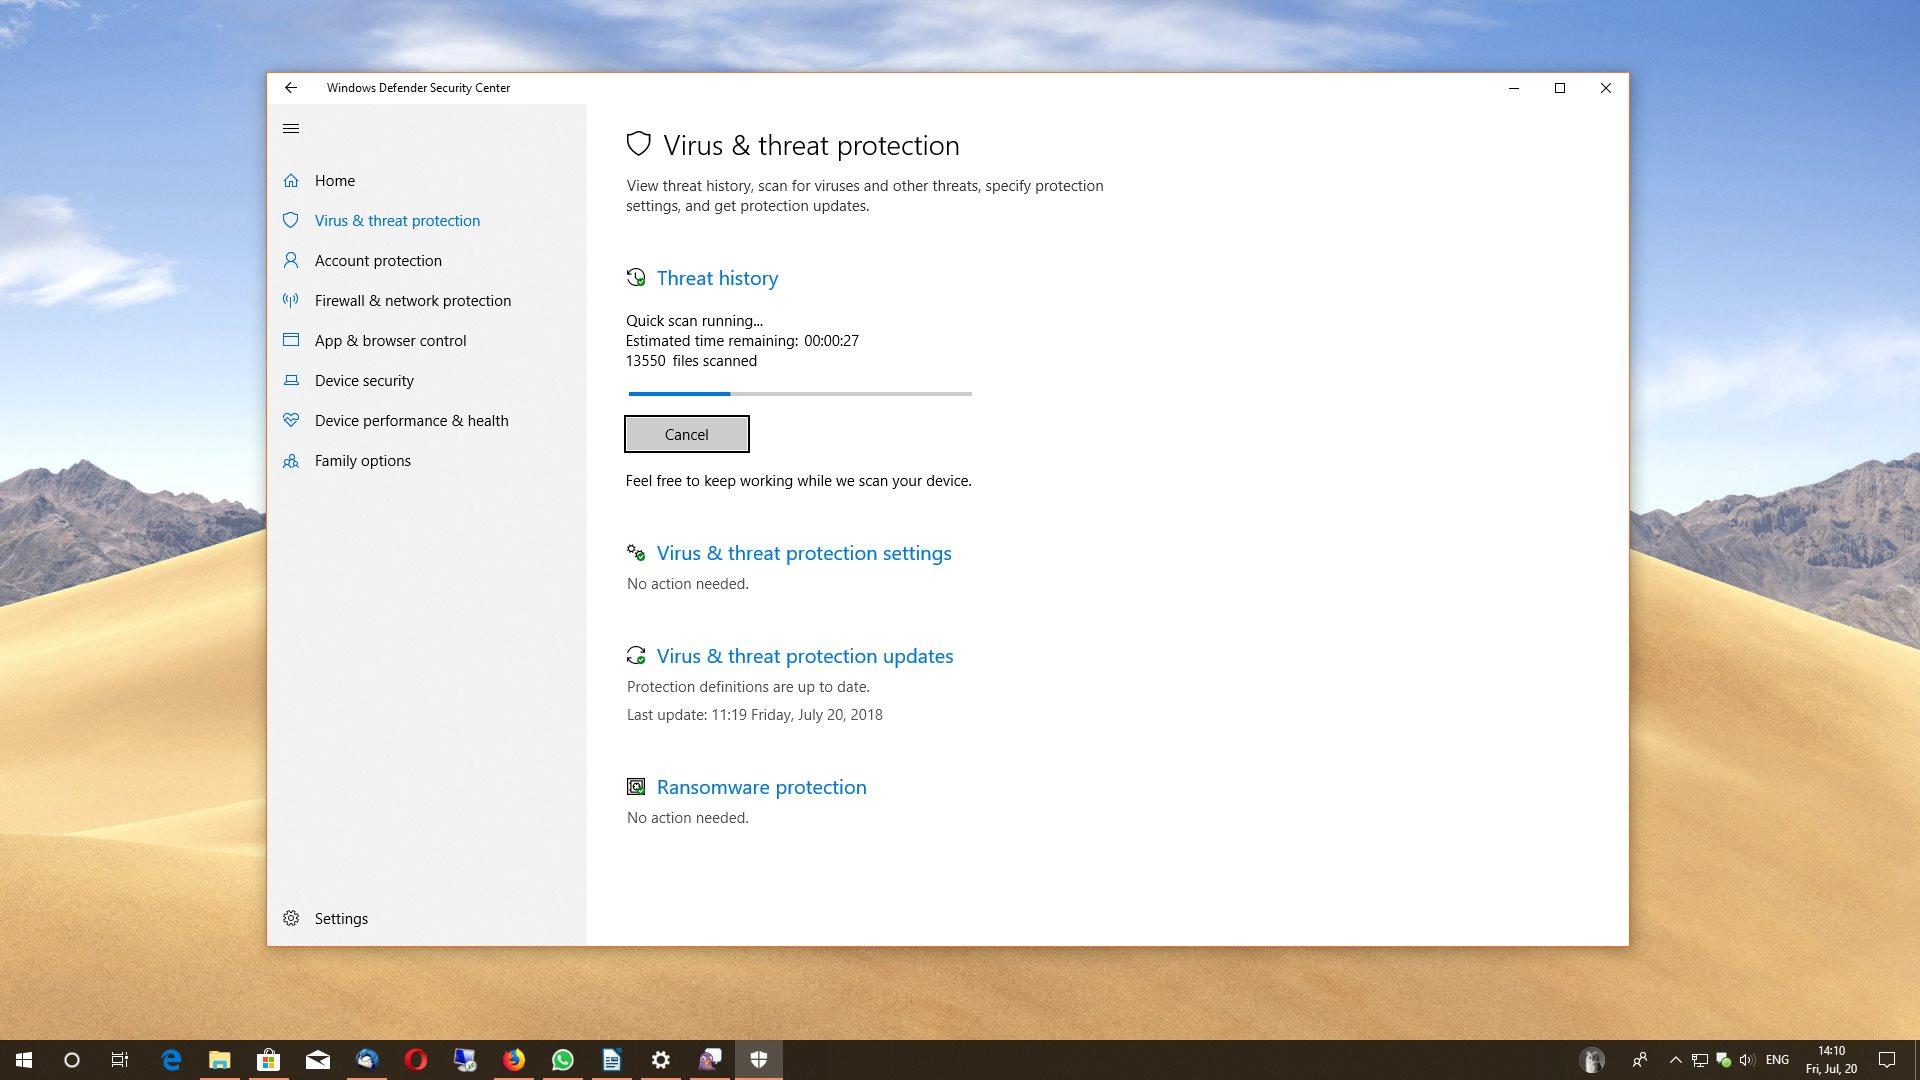 Do We Still Need a Third-Party Antivirus on Windows 10?